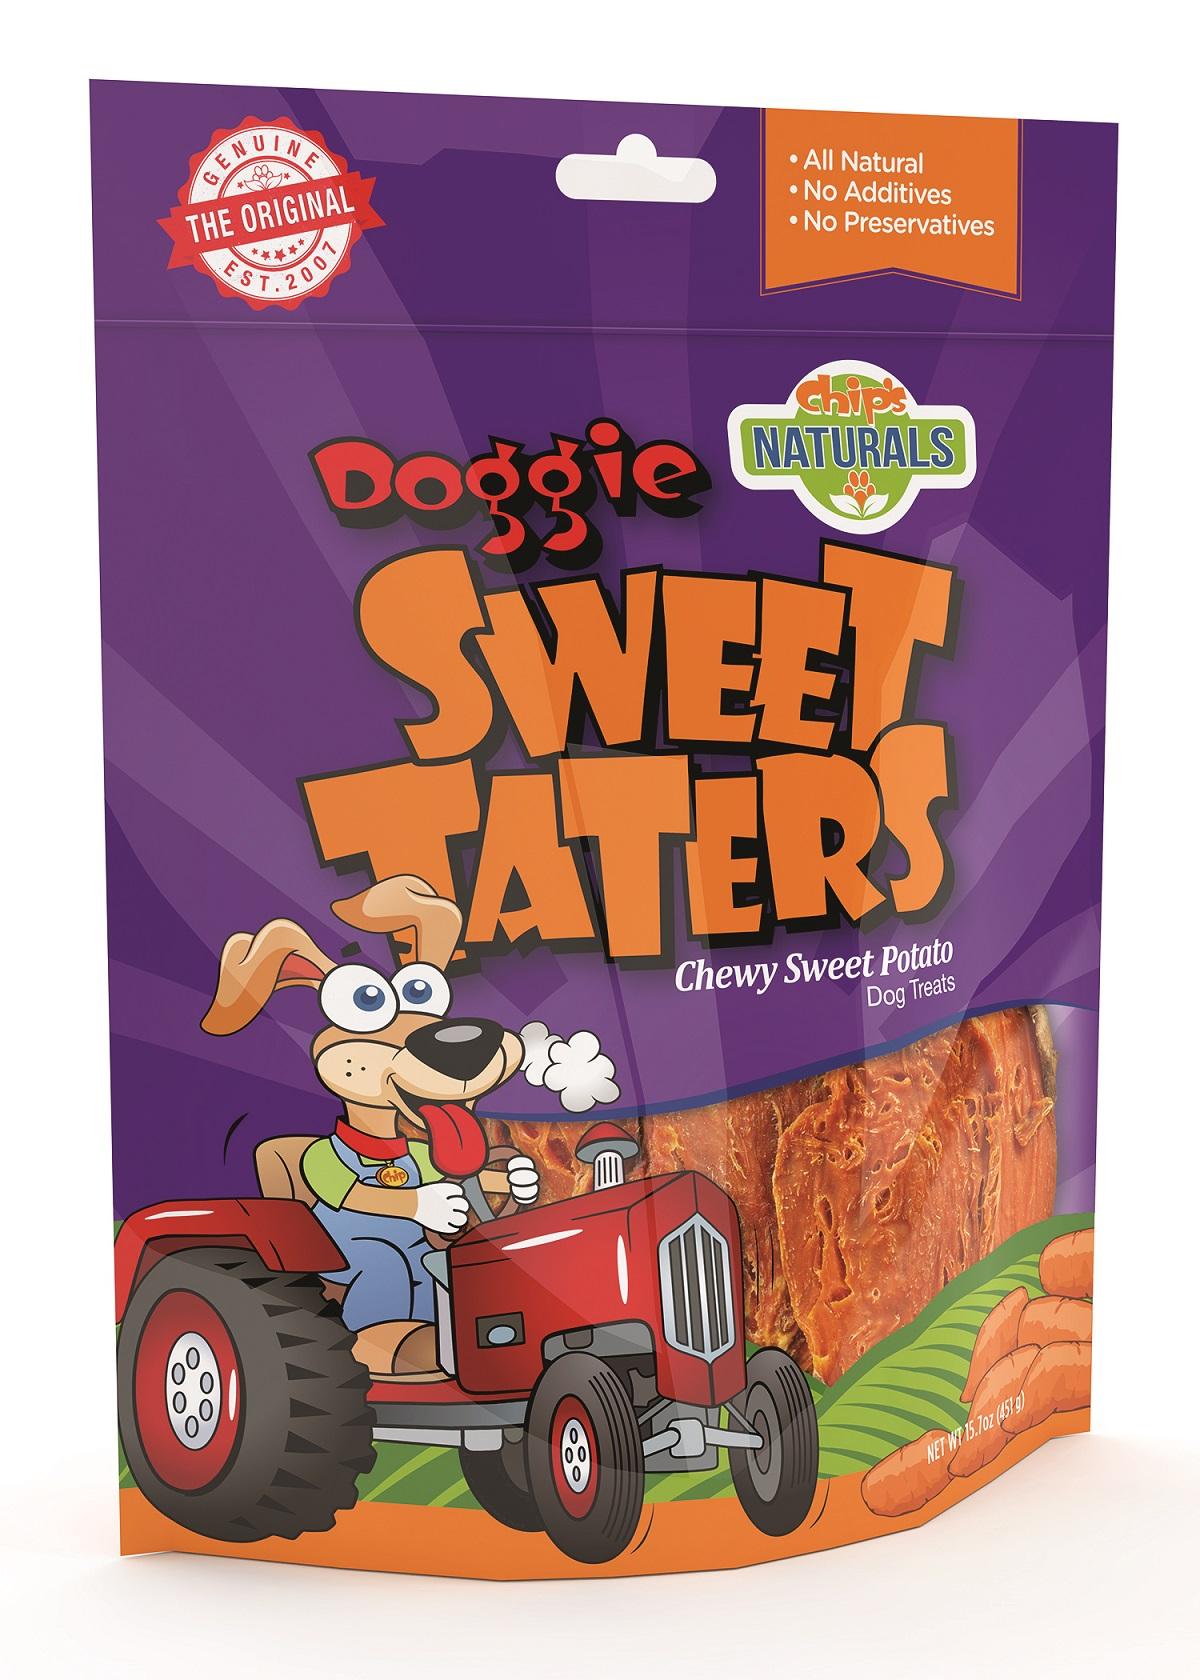 Chip's Naturals Doggie Sweet Taters Dog Treats, 15.7-oz